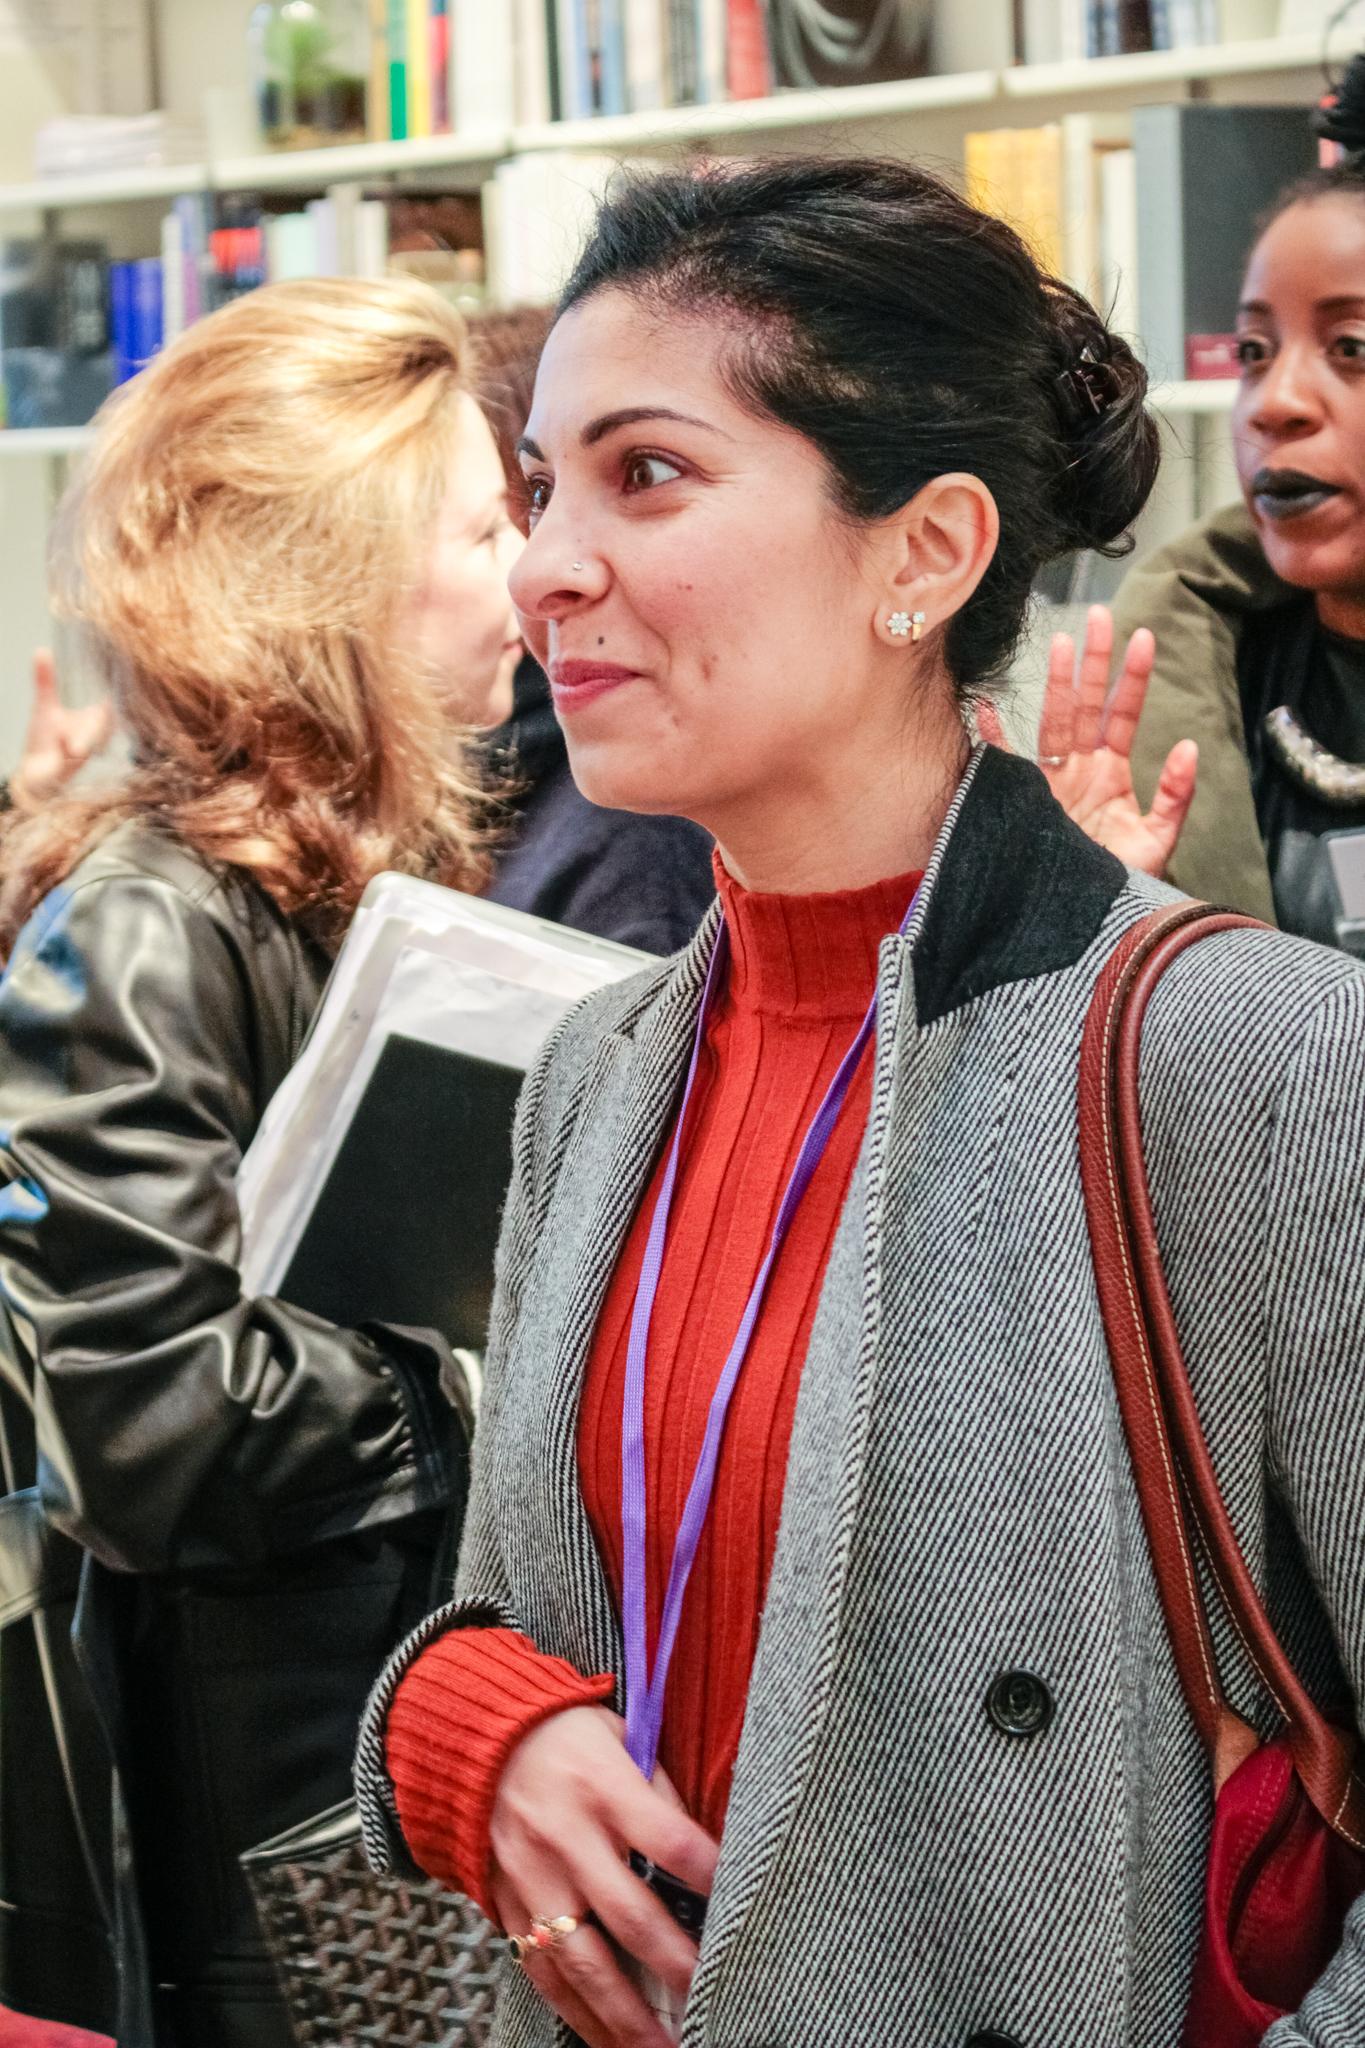 Sheetal Varma